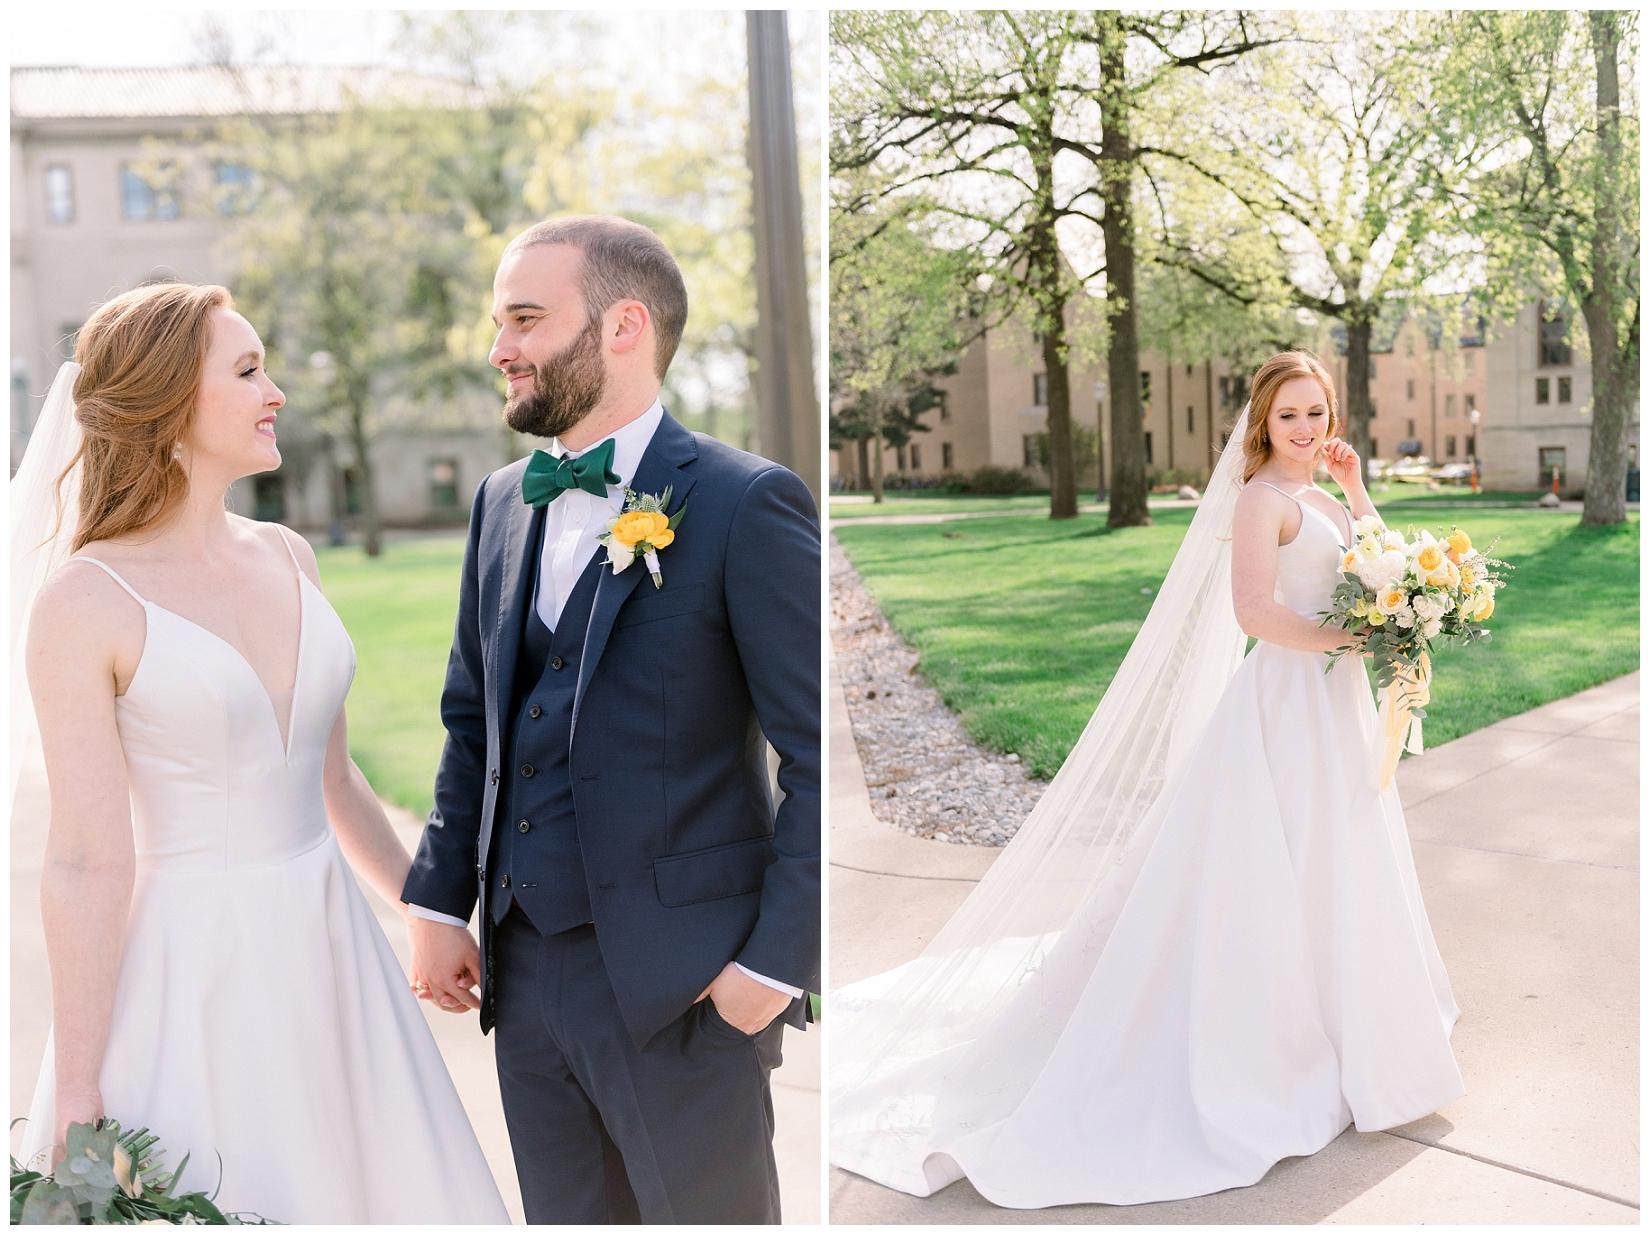 cat-alkire-wedding-photographer-indiana-chicago-indianapolis-fort-wayne_1216.jpg